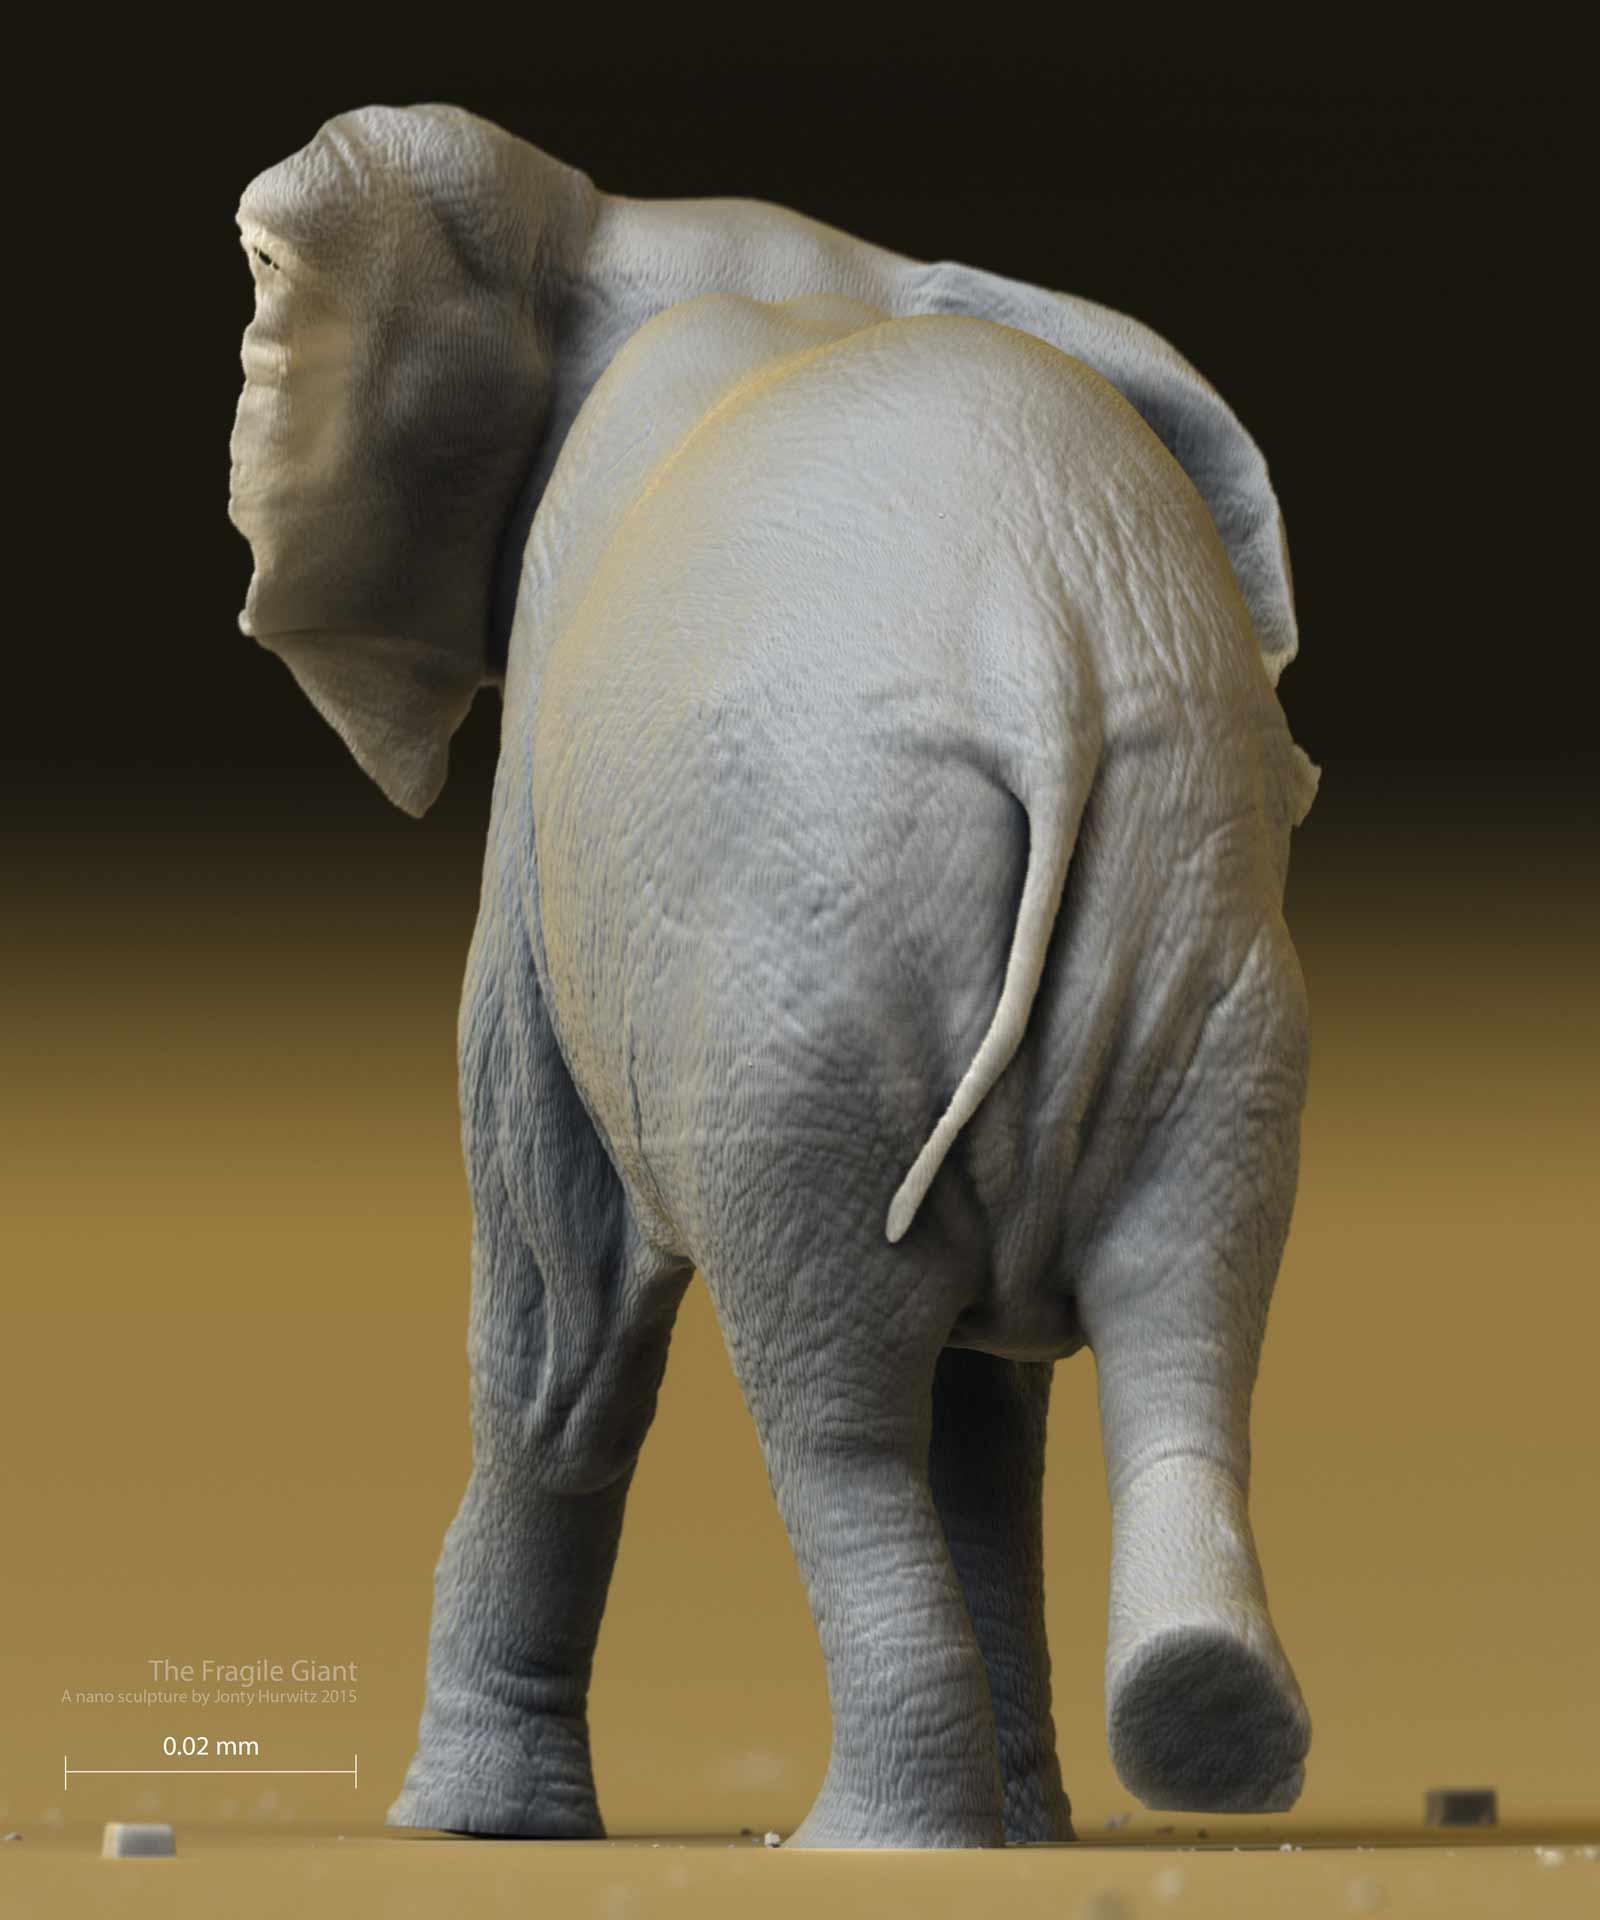 elephant_0206_4k_4-(1).jpg